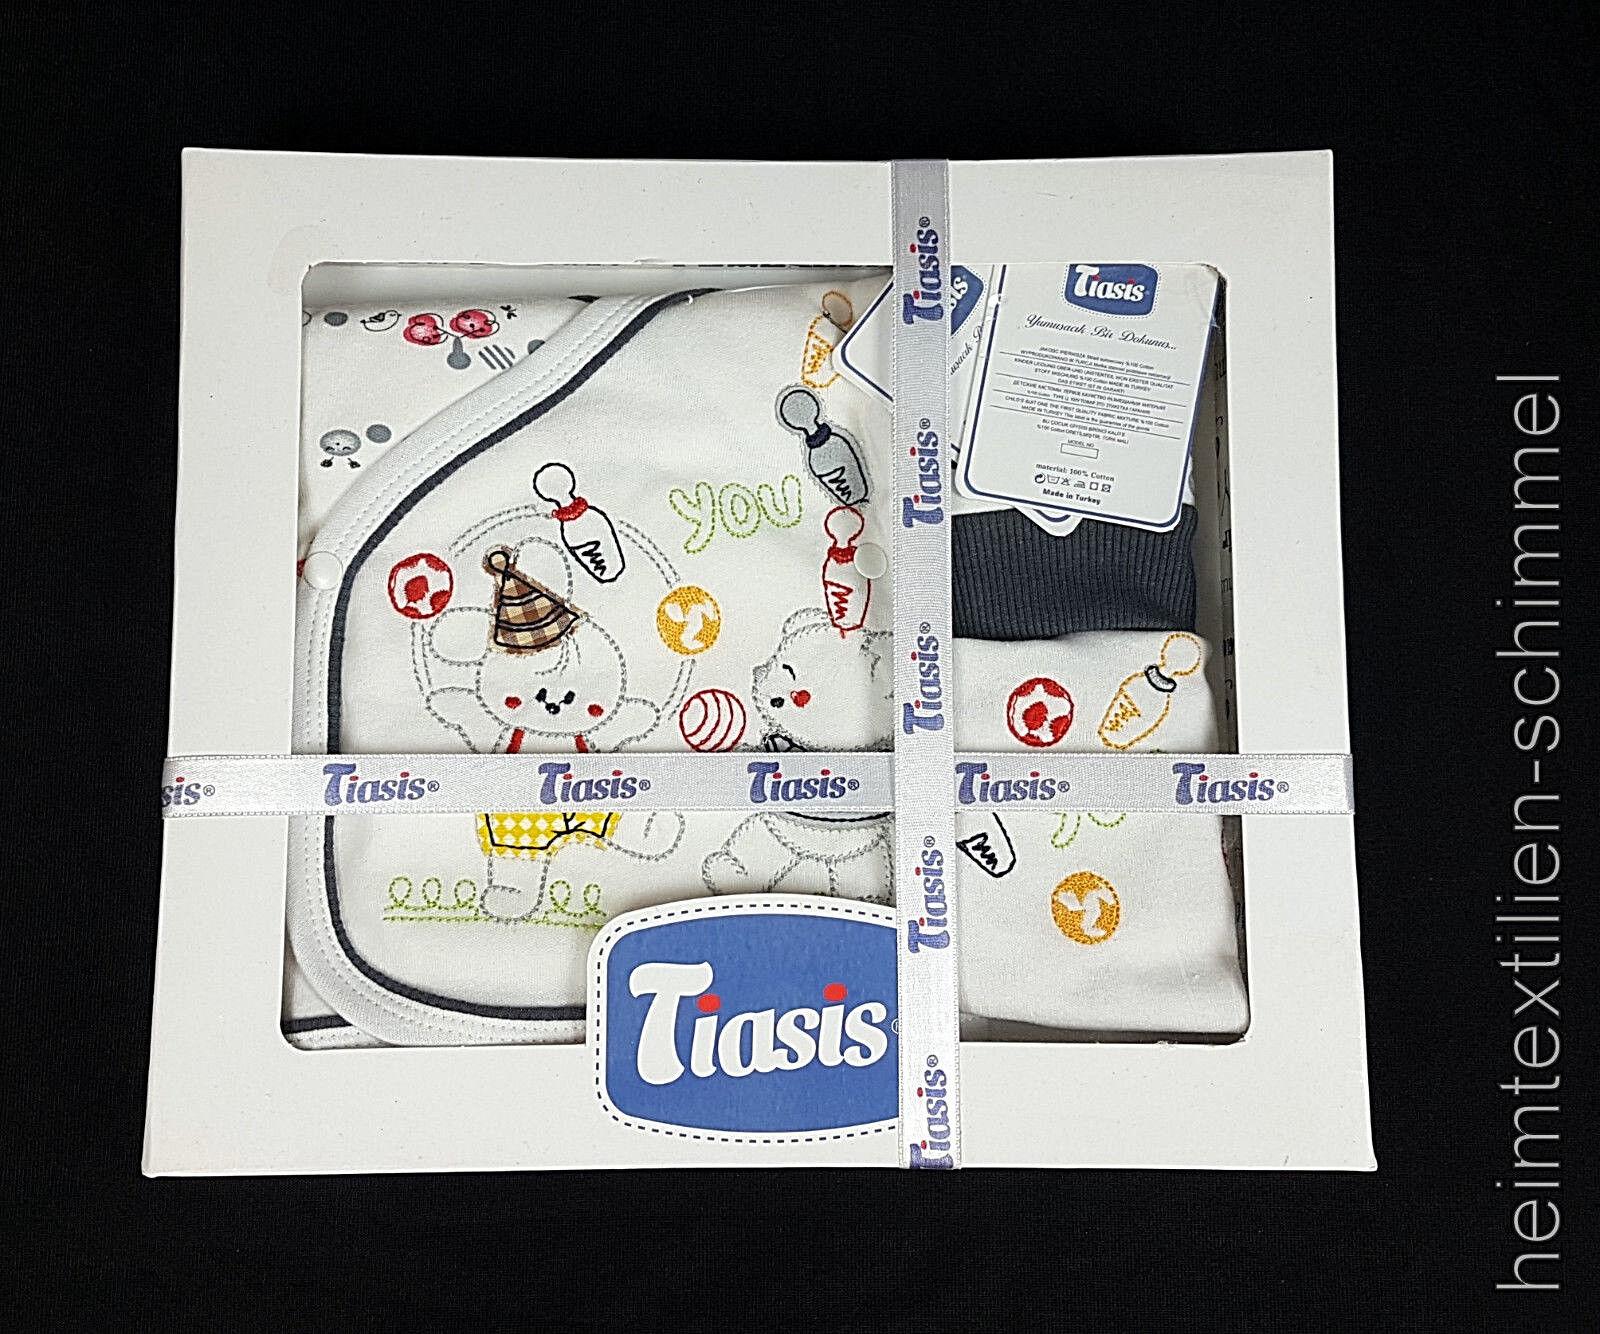 TIASIS® Babybekleidung Baby Erstausstattung Babykleidung Strampler Kleidung SET